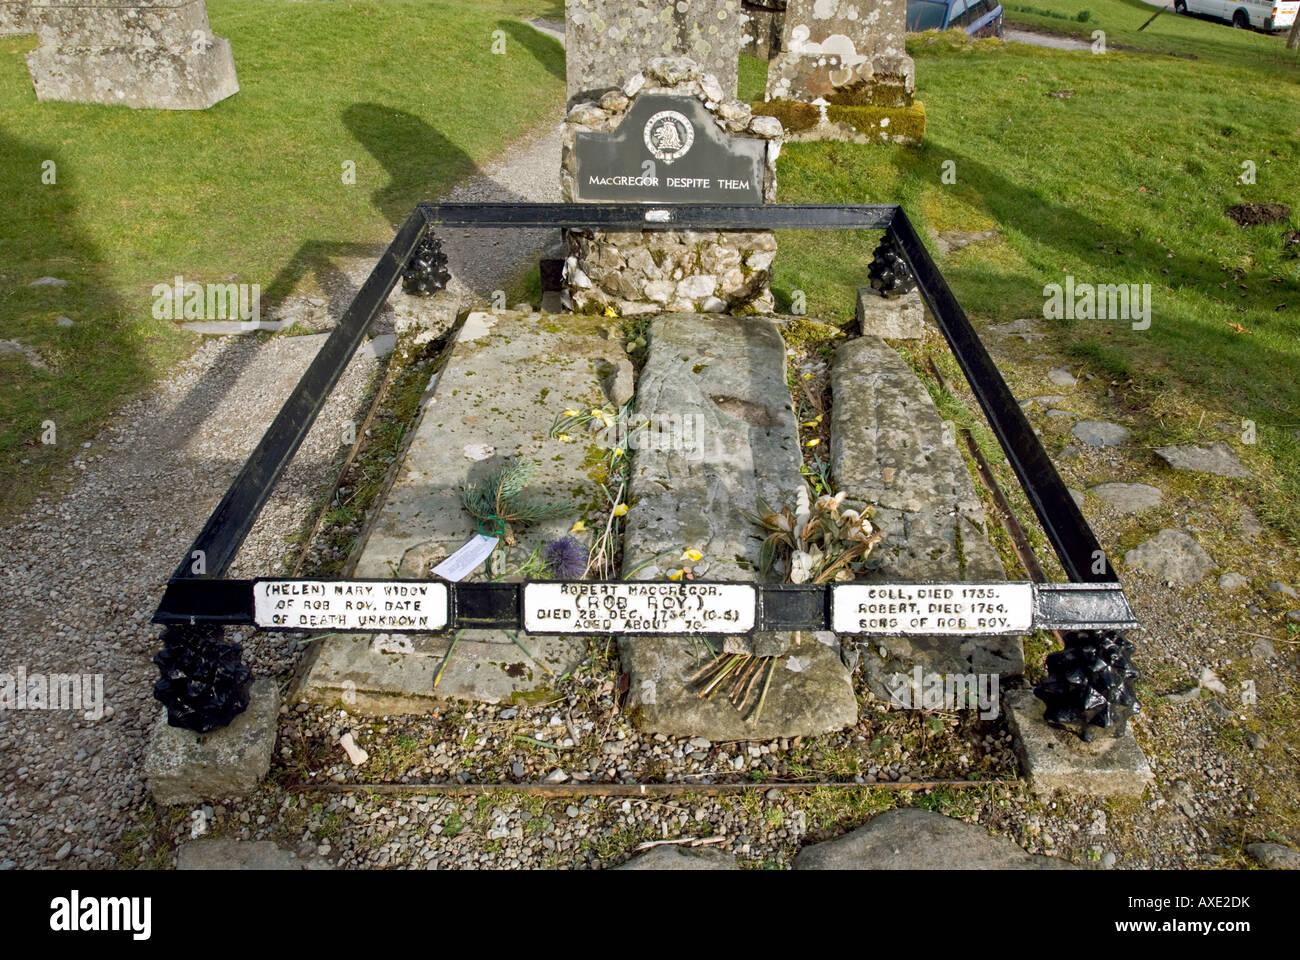 La tumba de Rob Roy McGregor en Balquhidder iglesia en Escocia Strathyre Foto de stock